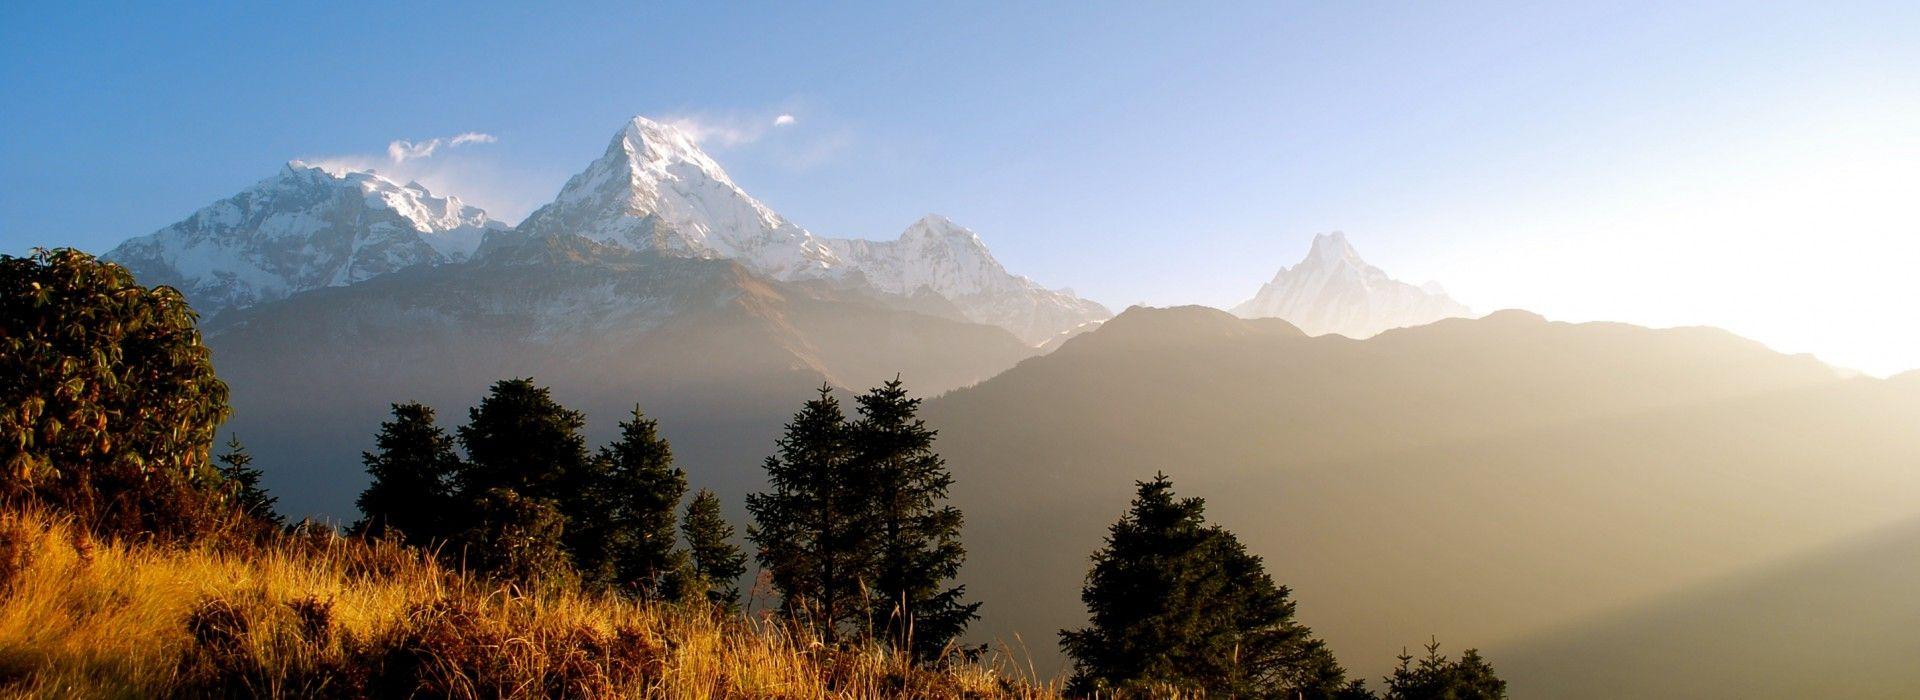 Trekking Tours in Chitwan National Park